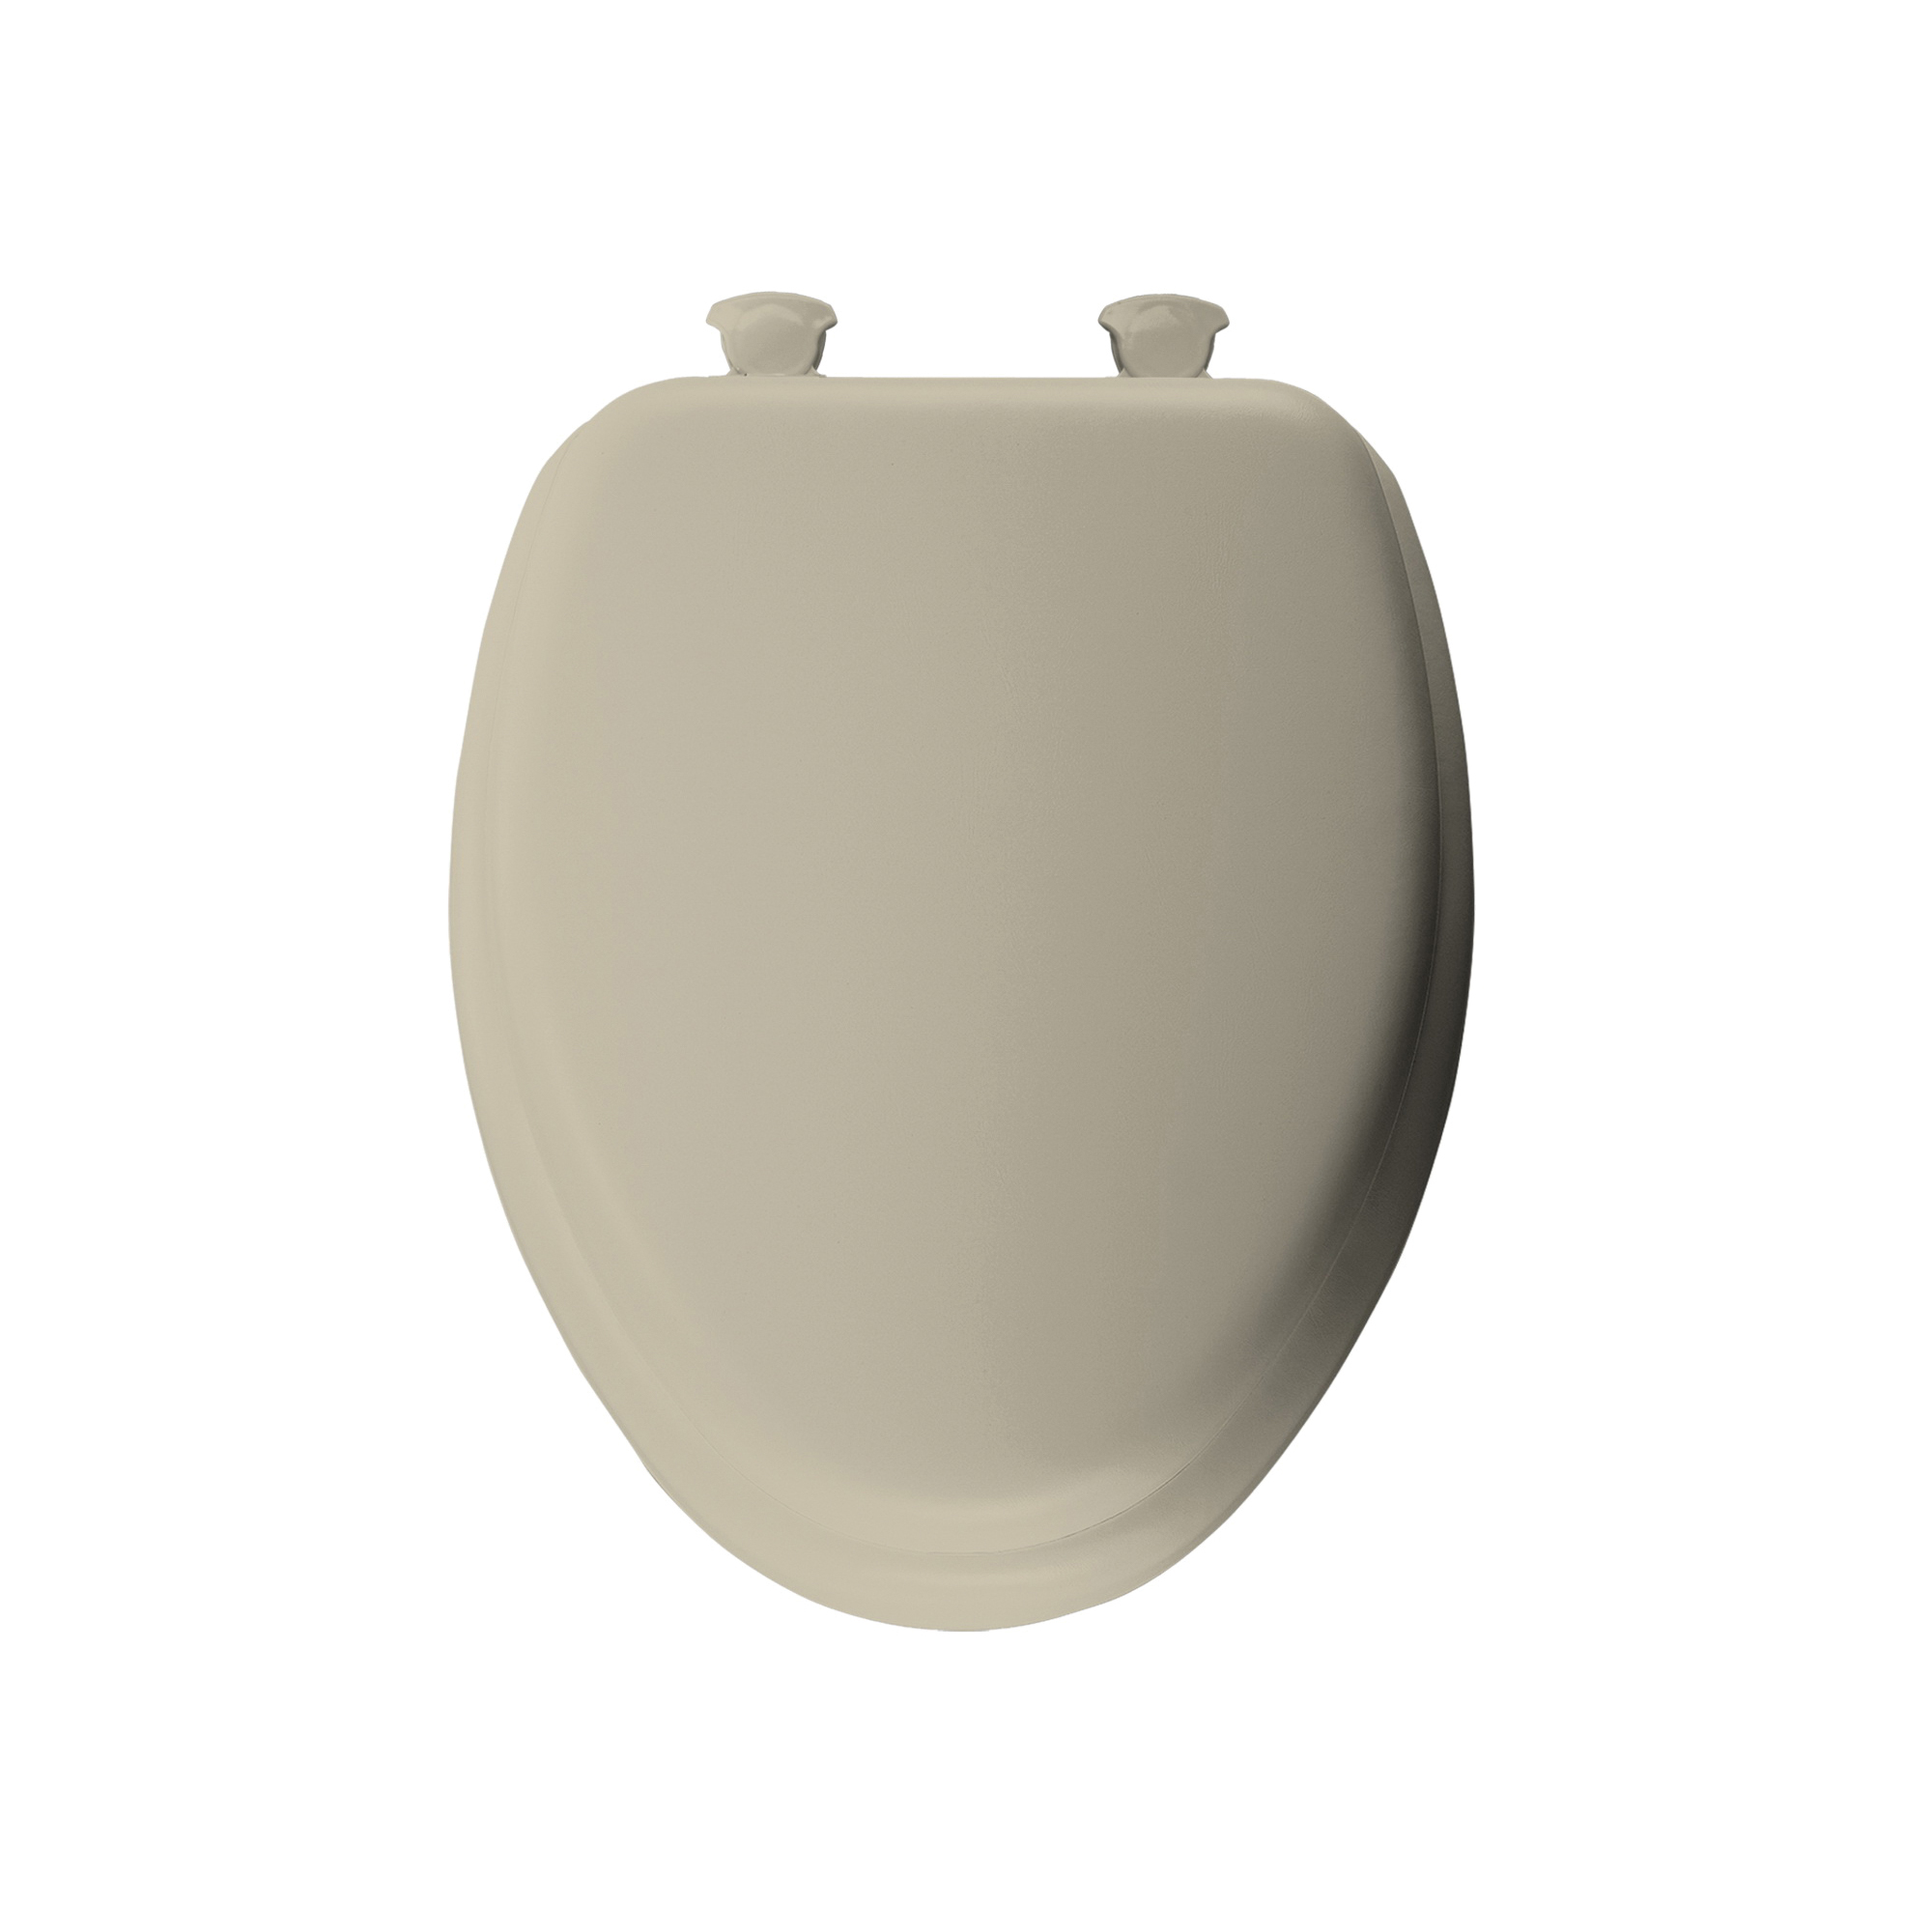 Mayfair® 113EC 006 Toilet Seat, Elongated Bowl, Closed Front, Wood, Bone, Domestic